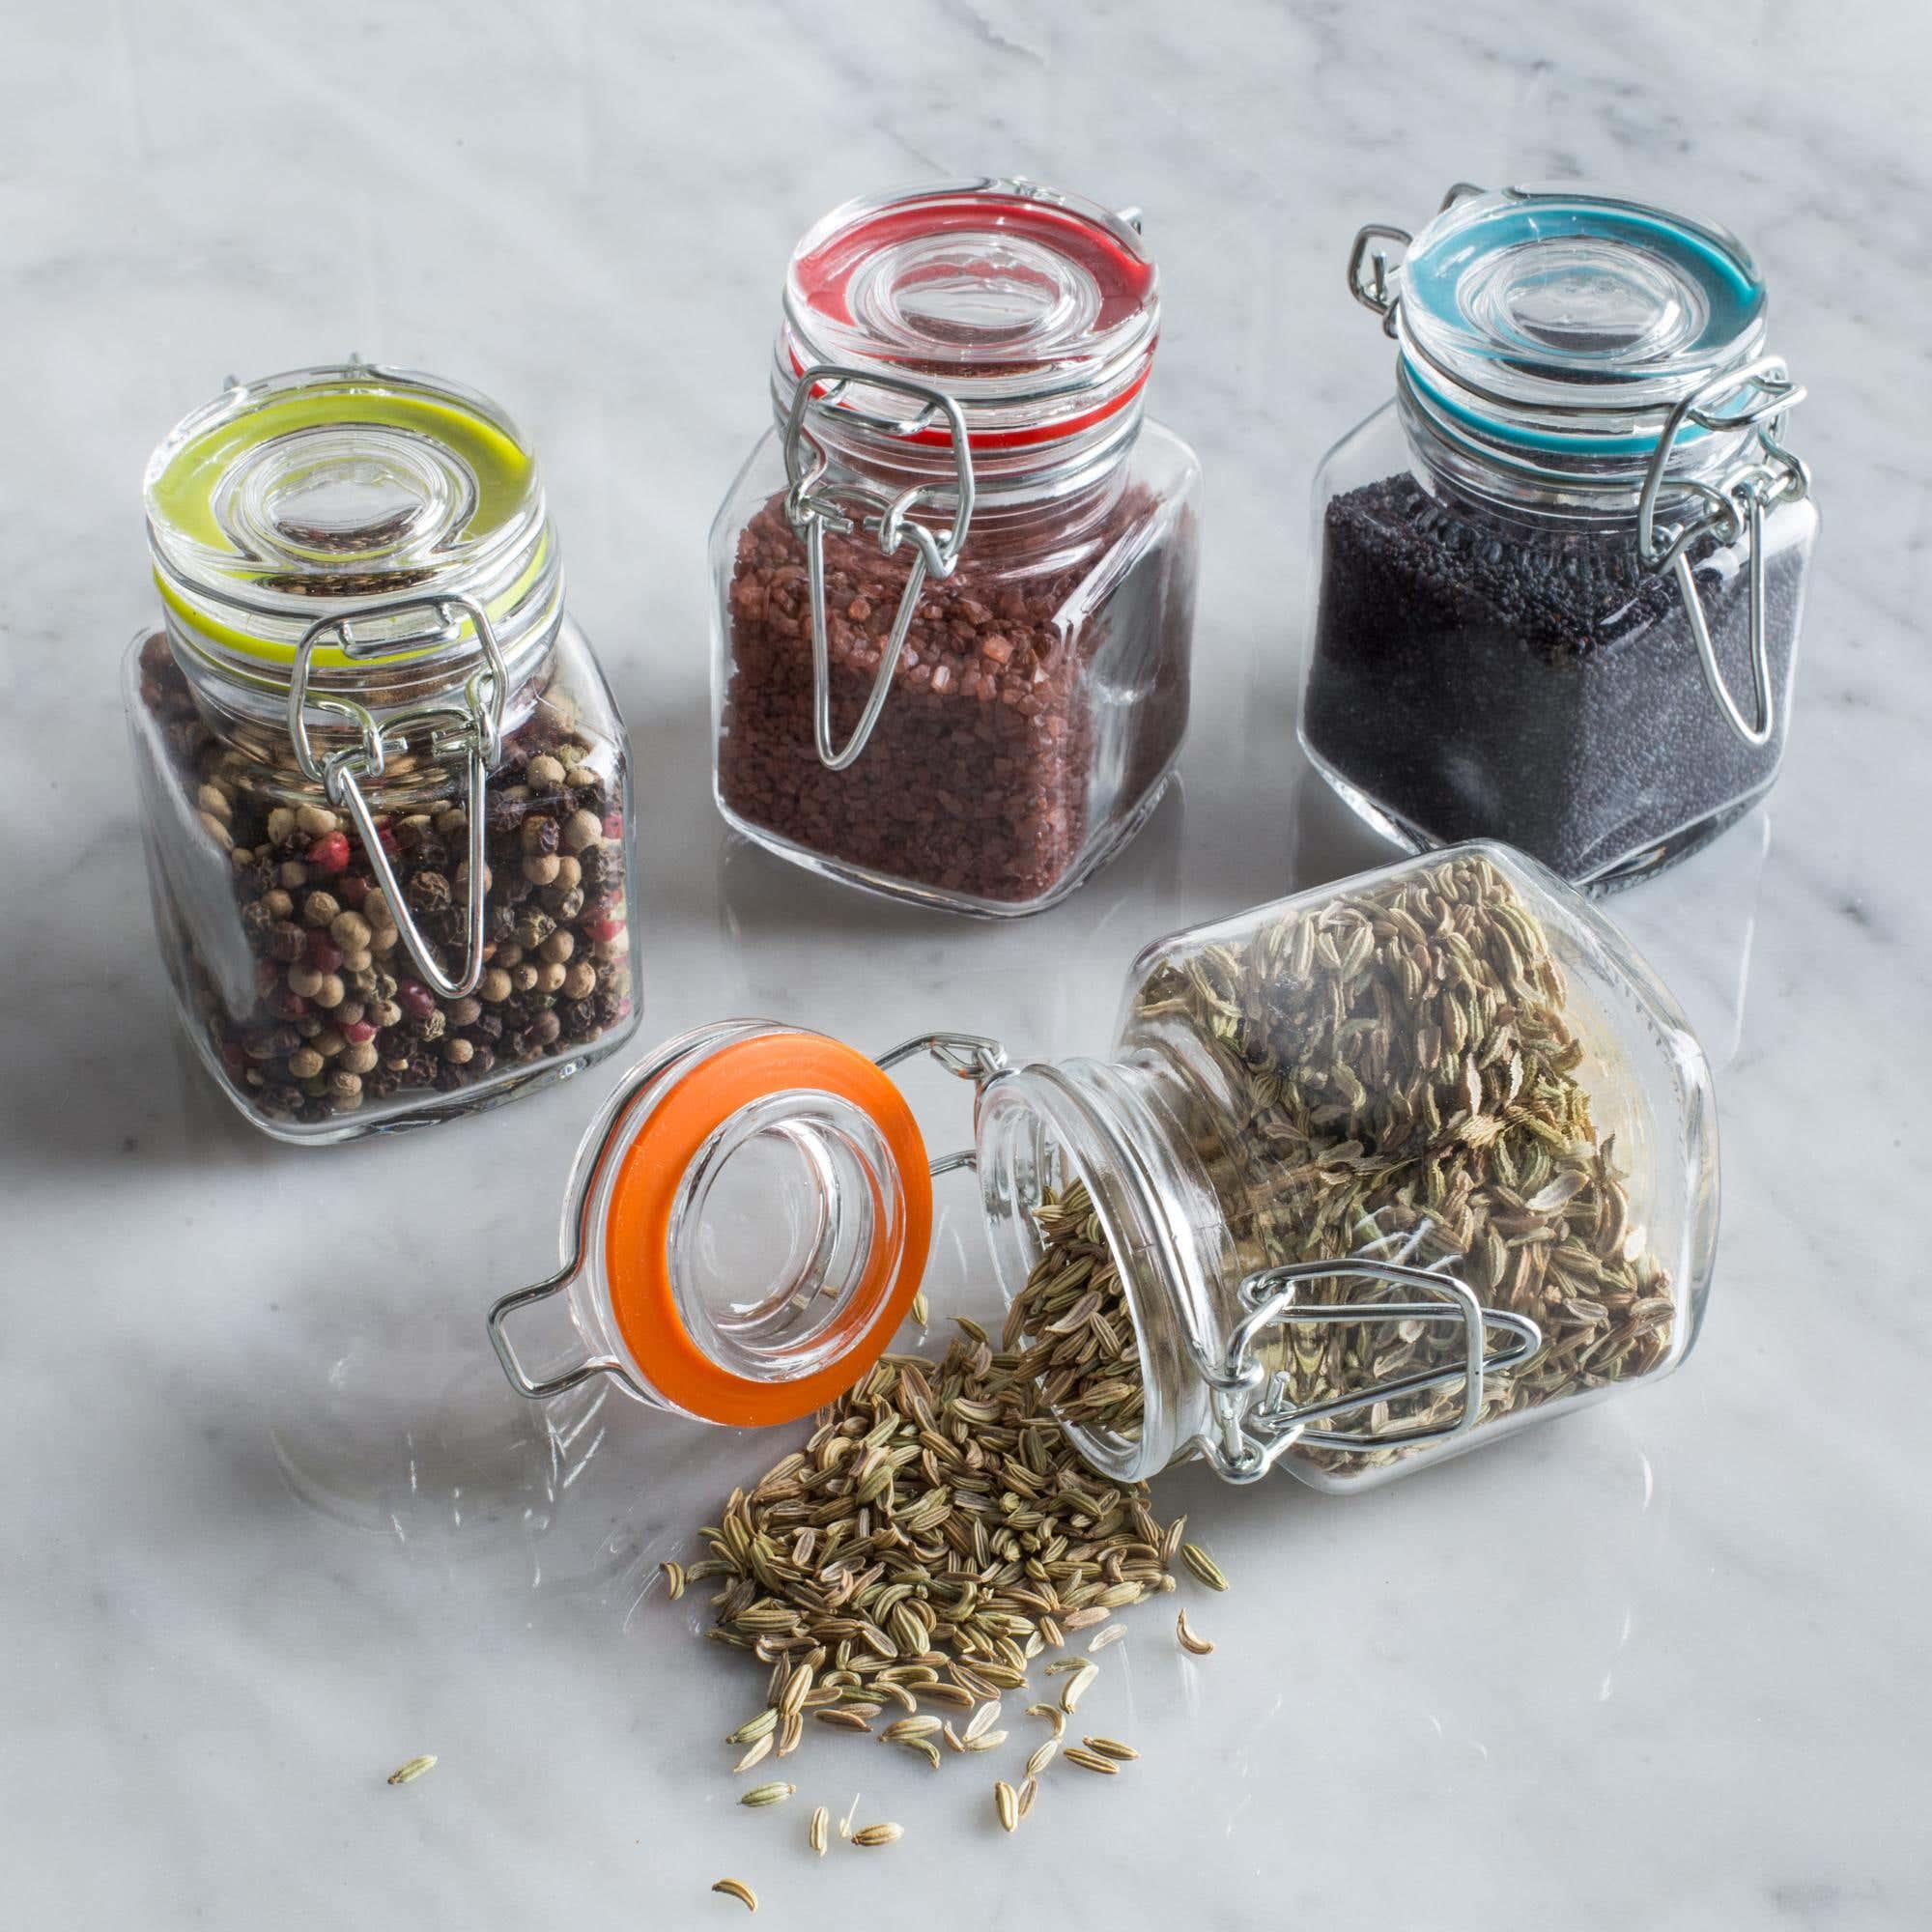 ksp colour splash glass spice jars set of 4 multi colour